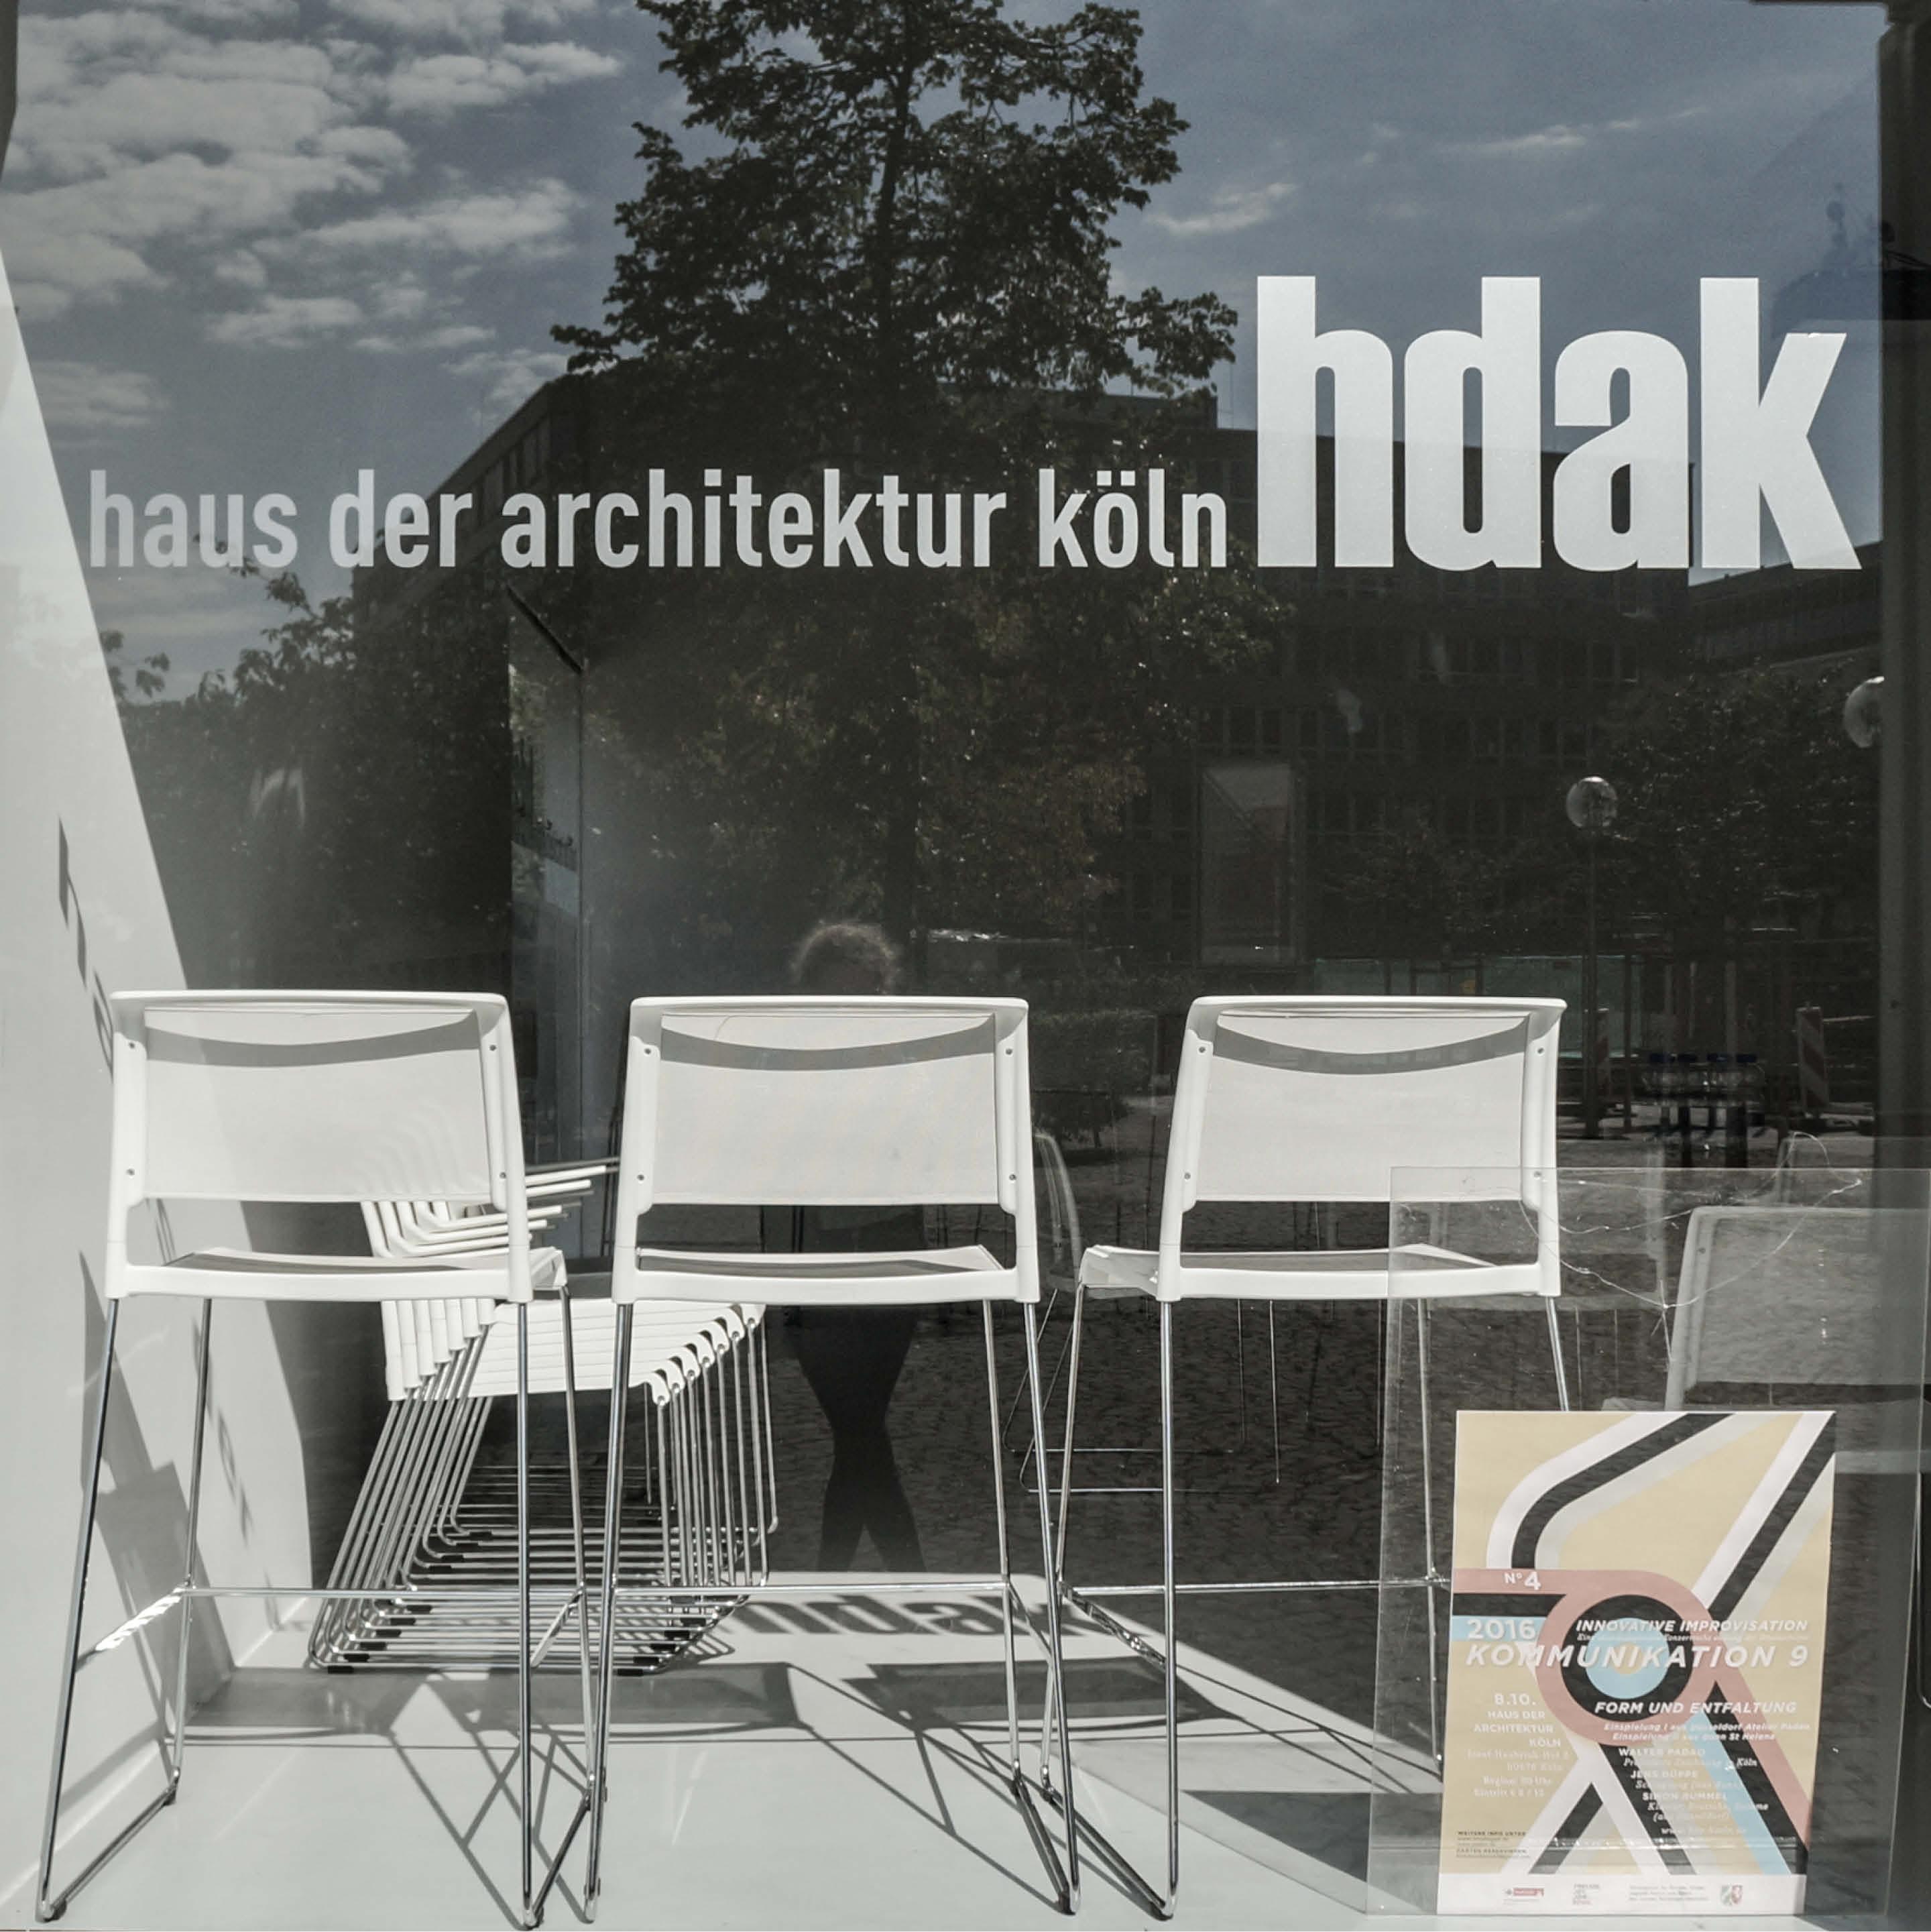 haus der architektur k ln. Black Bedroom Furniture Sets. Home Design Ideas